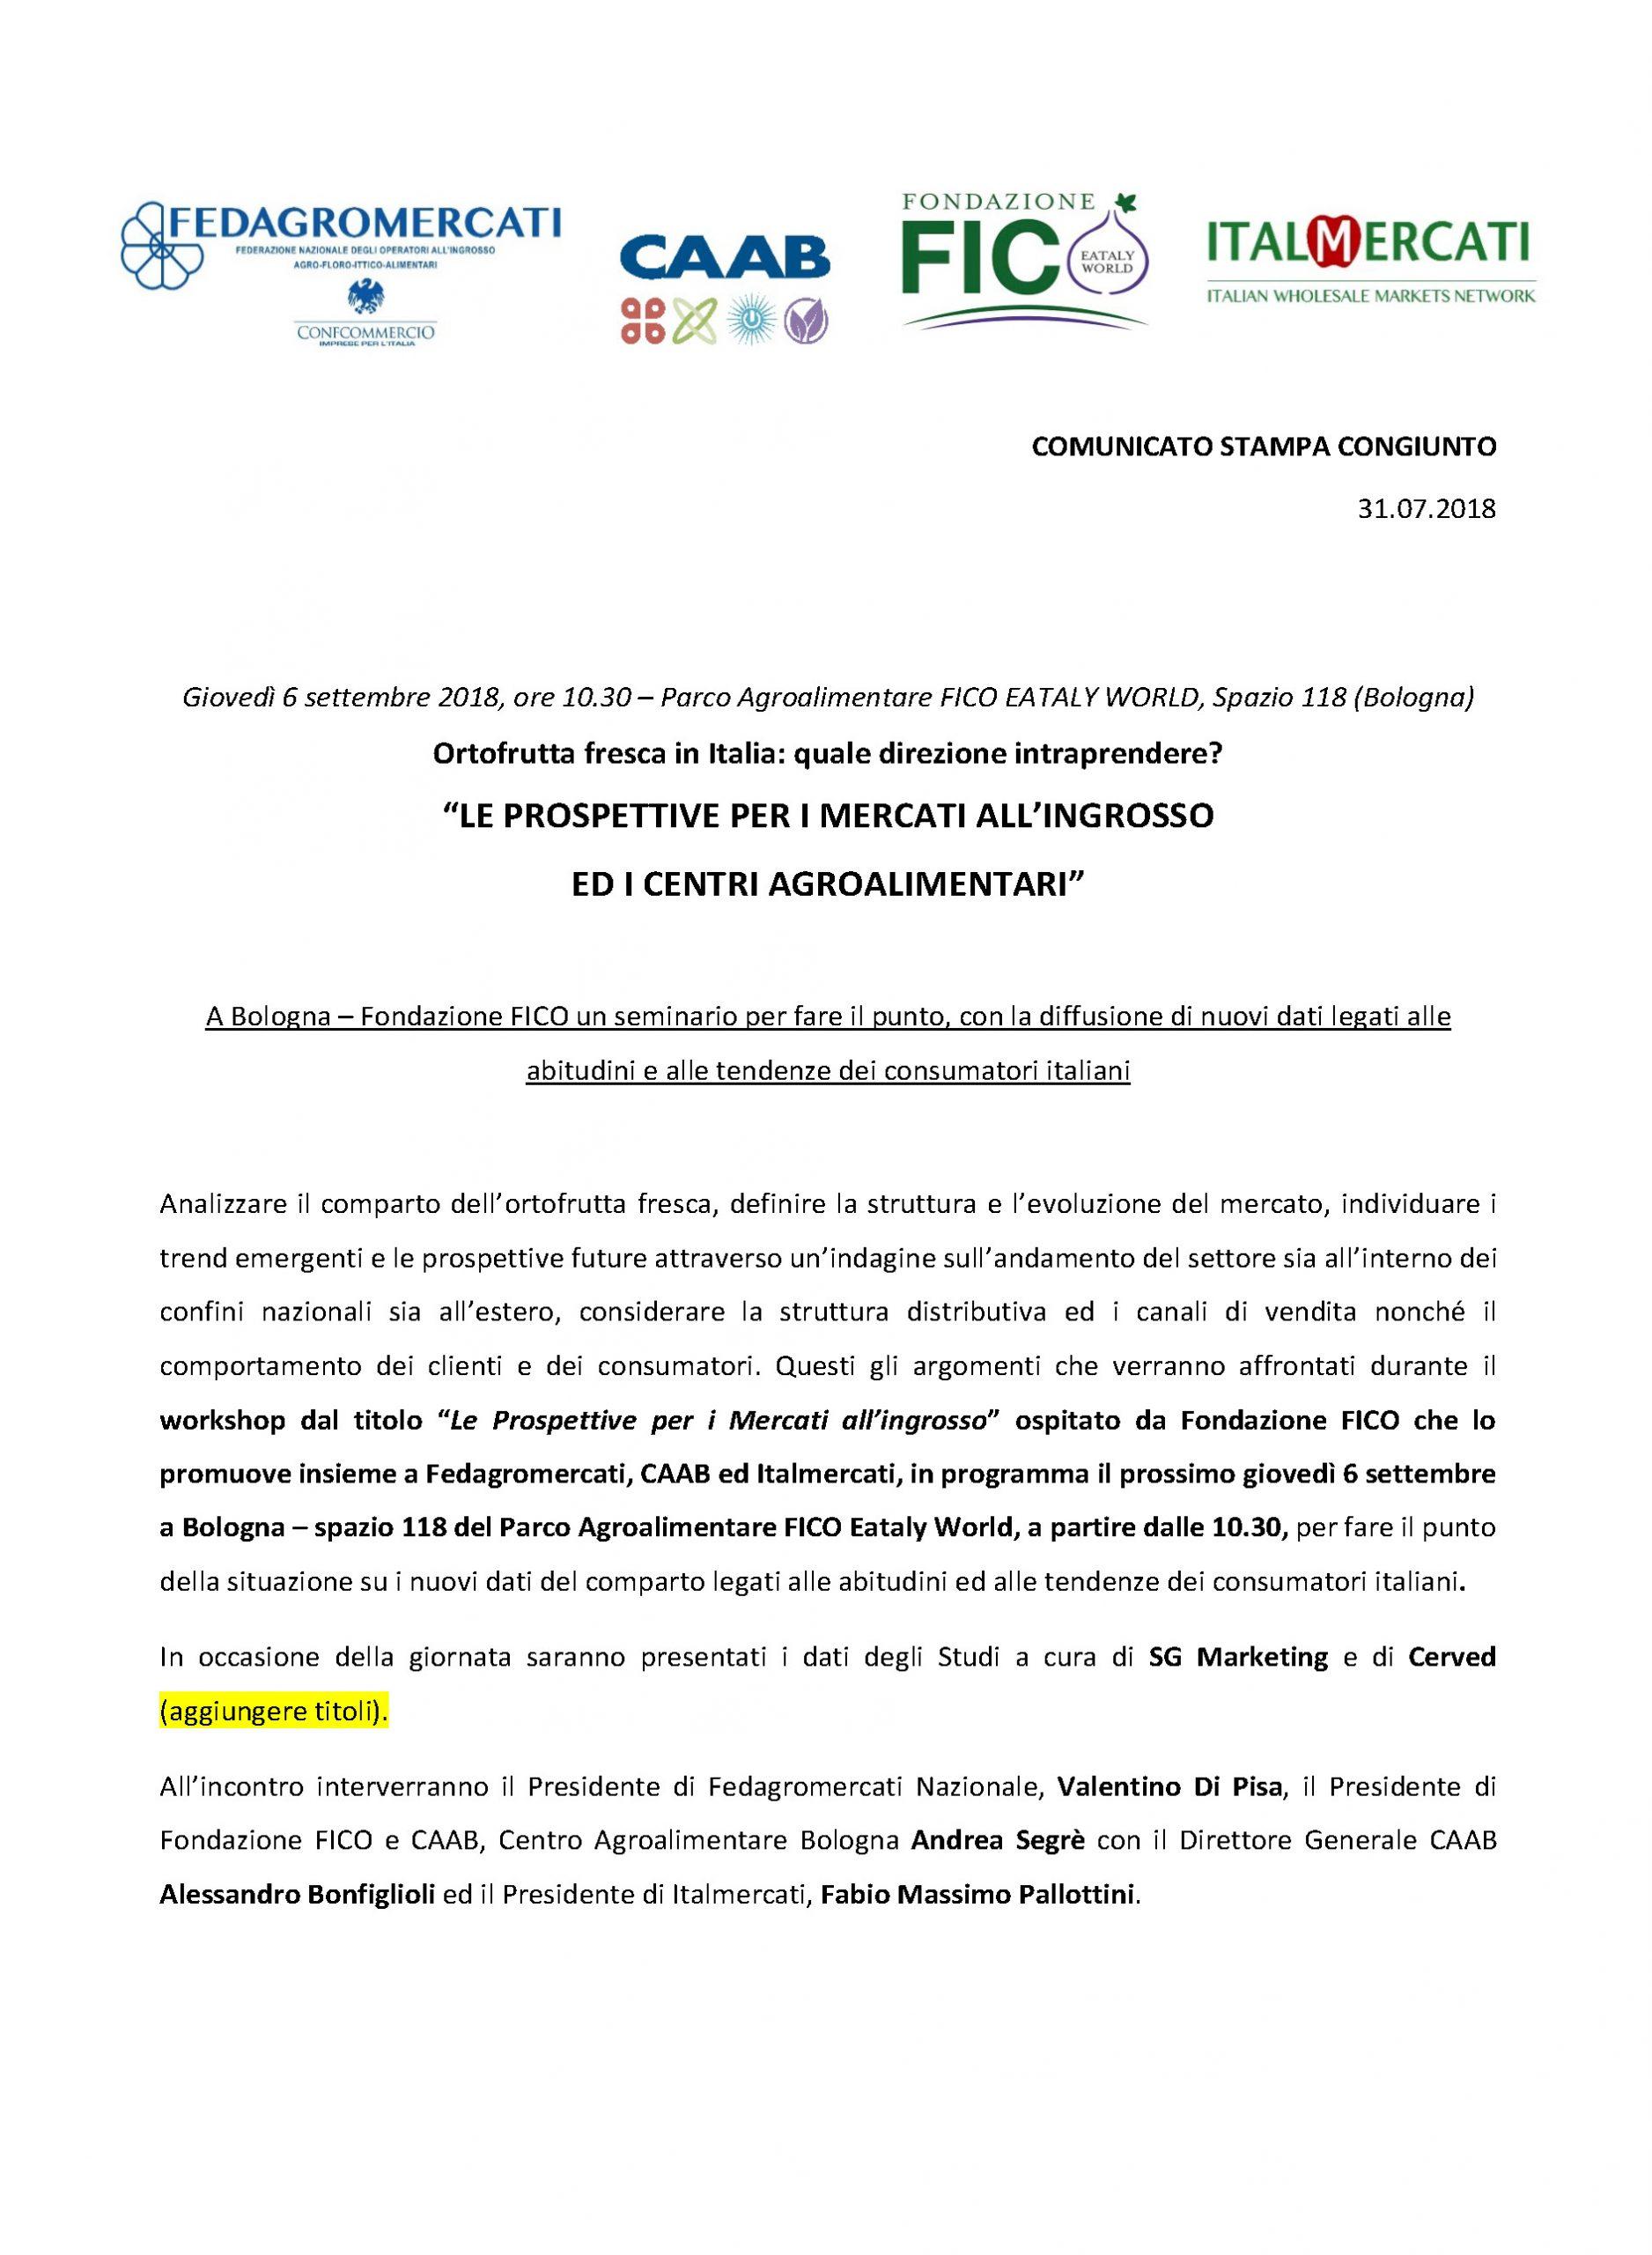 CS-0062-06-09-2018-mercati-ingrosso_Pagina_1